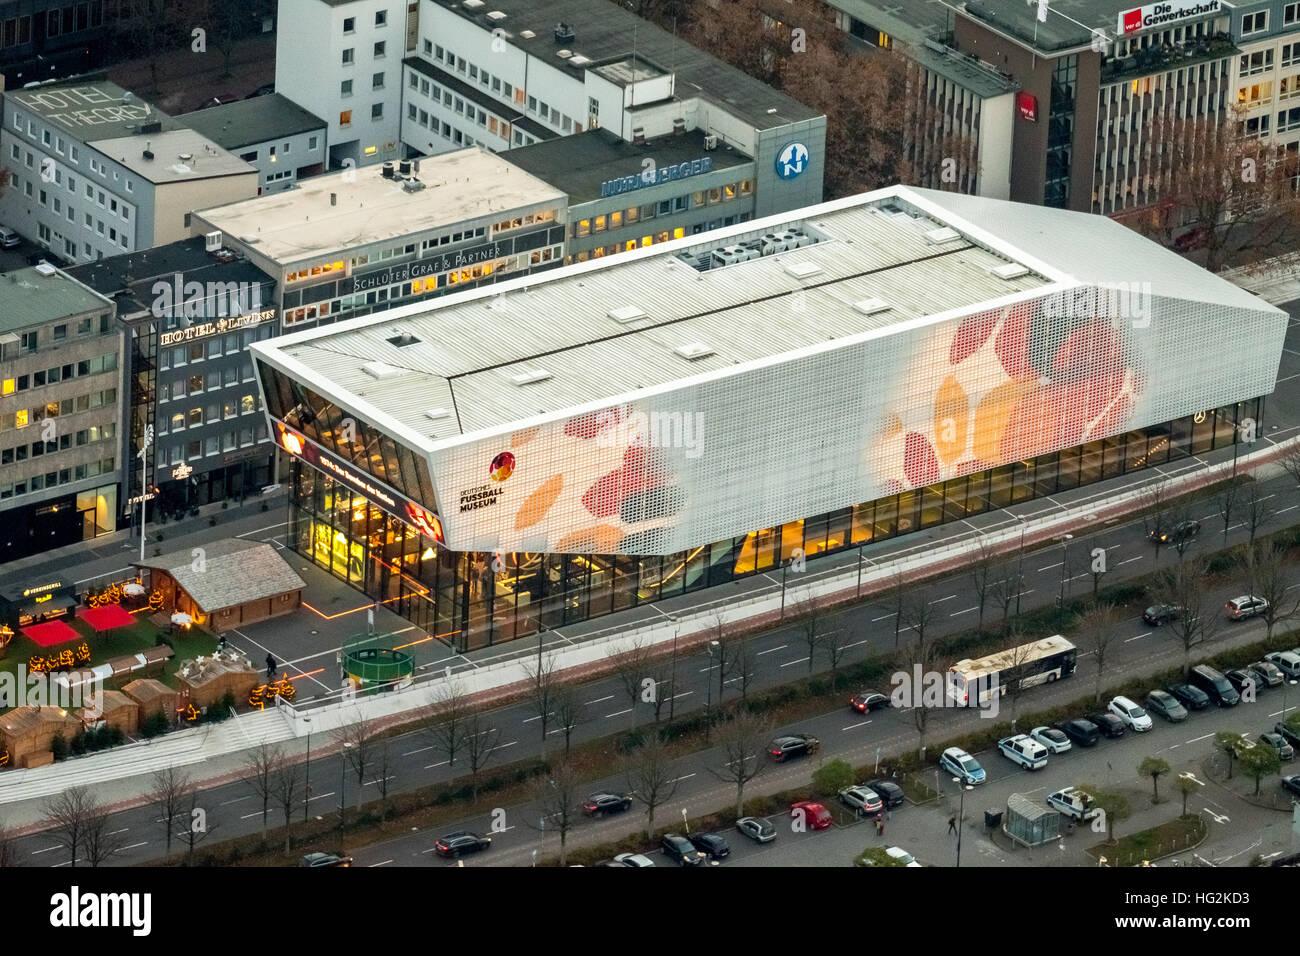 Aerial view, DFB Football Museum Dortmund at night, Football Museum, Dortmund, Ruhr aeria, north rhine-westphalia, - Stock Image